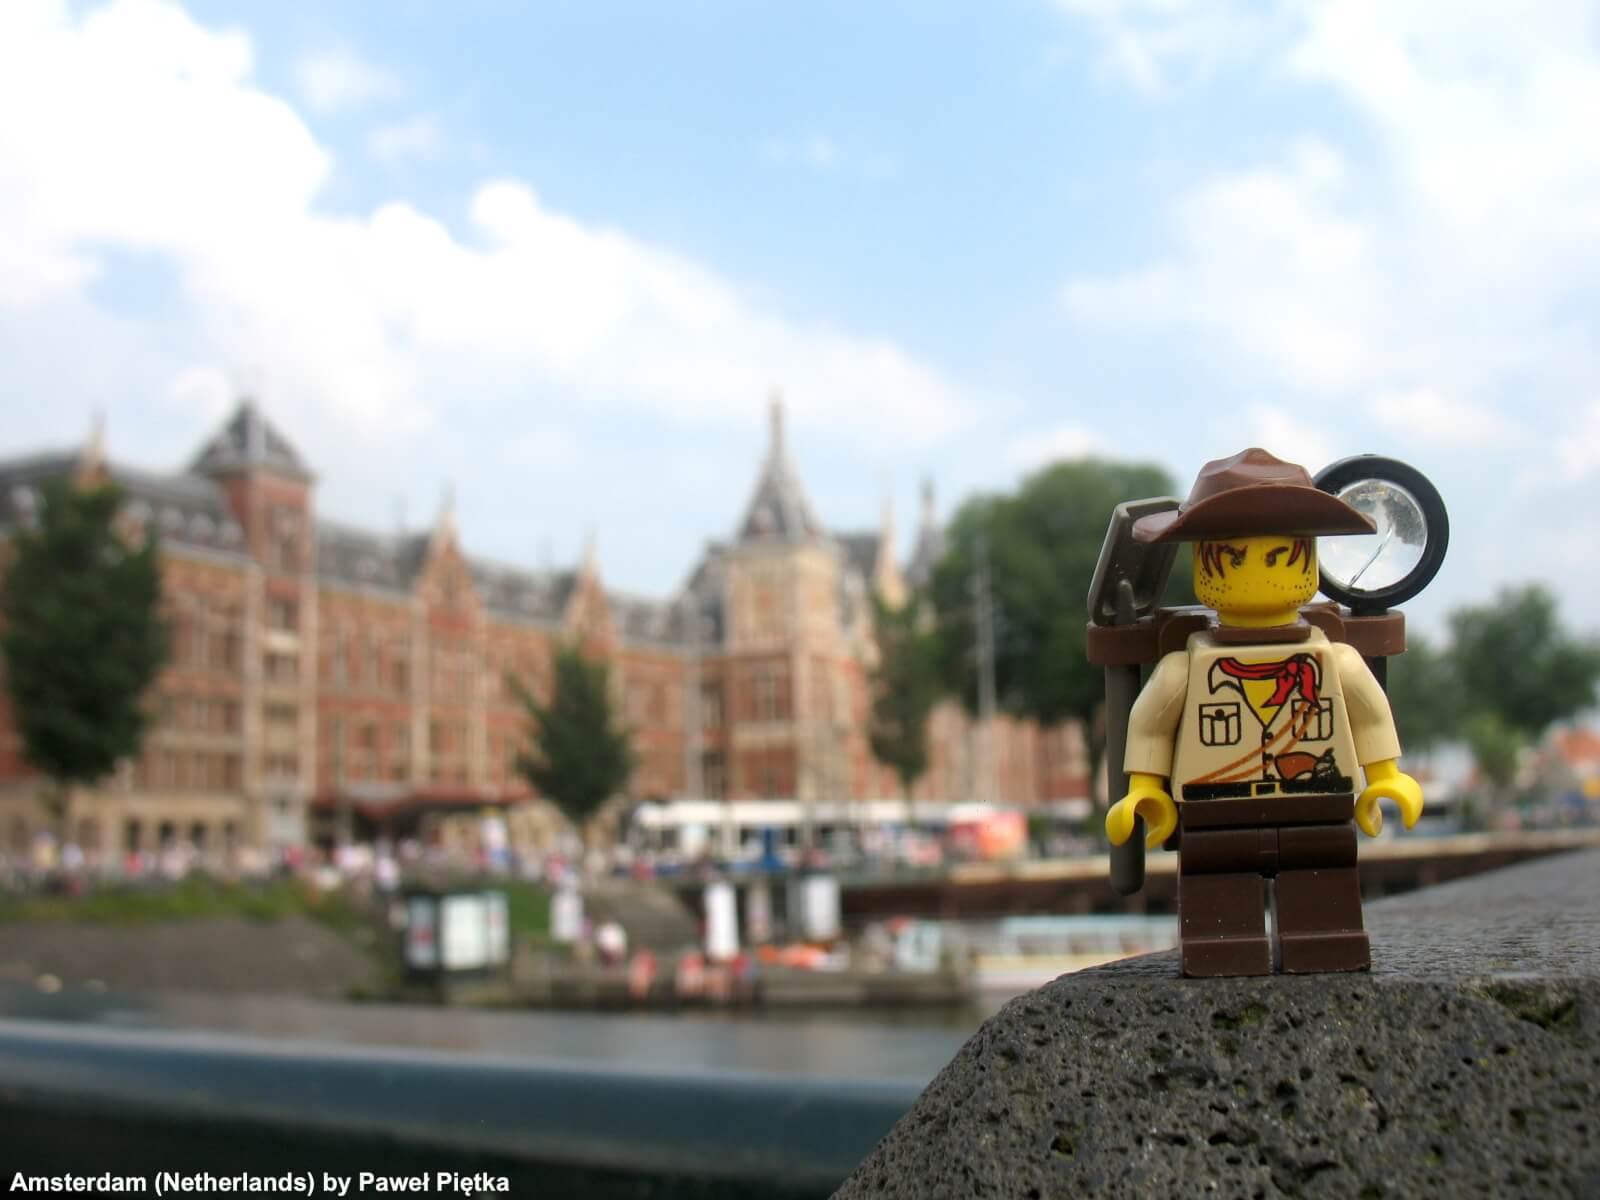 Amsterdam (Netherlands) - Amsterdam Centraal railway station